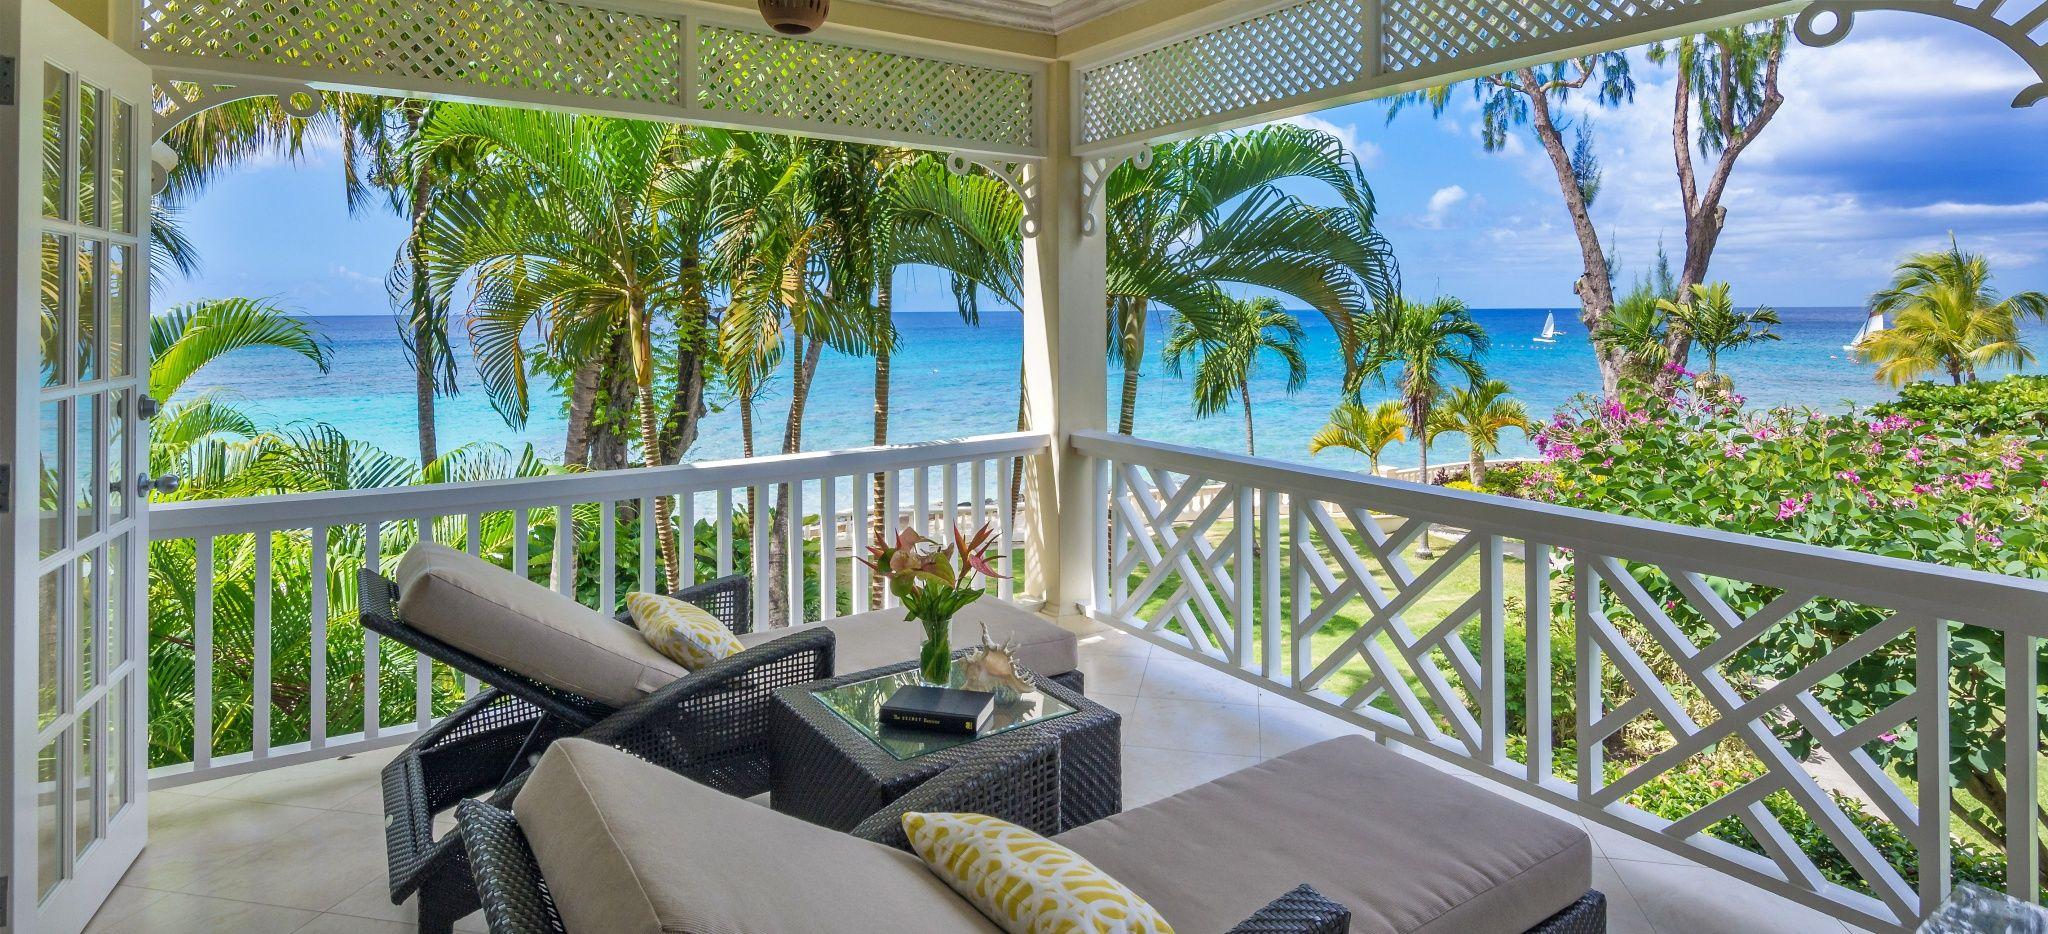 Ein Balkon im Coral Reef Club Barbados